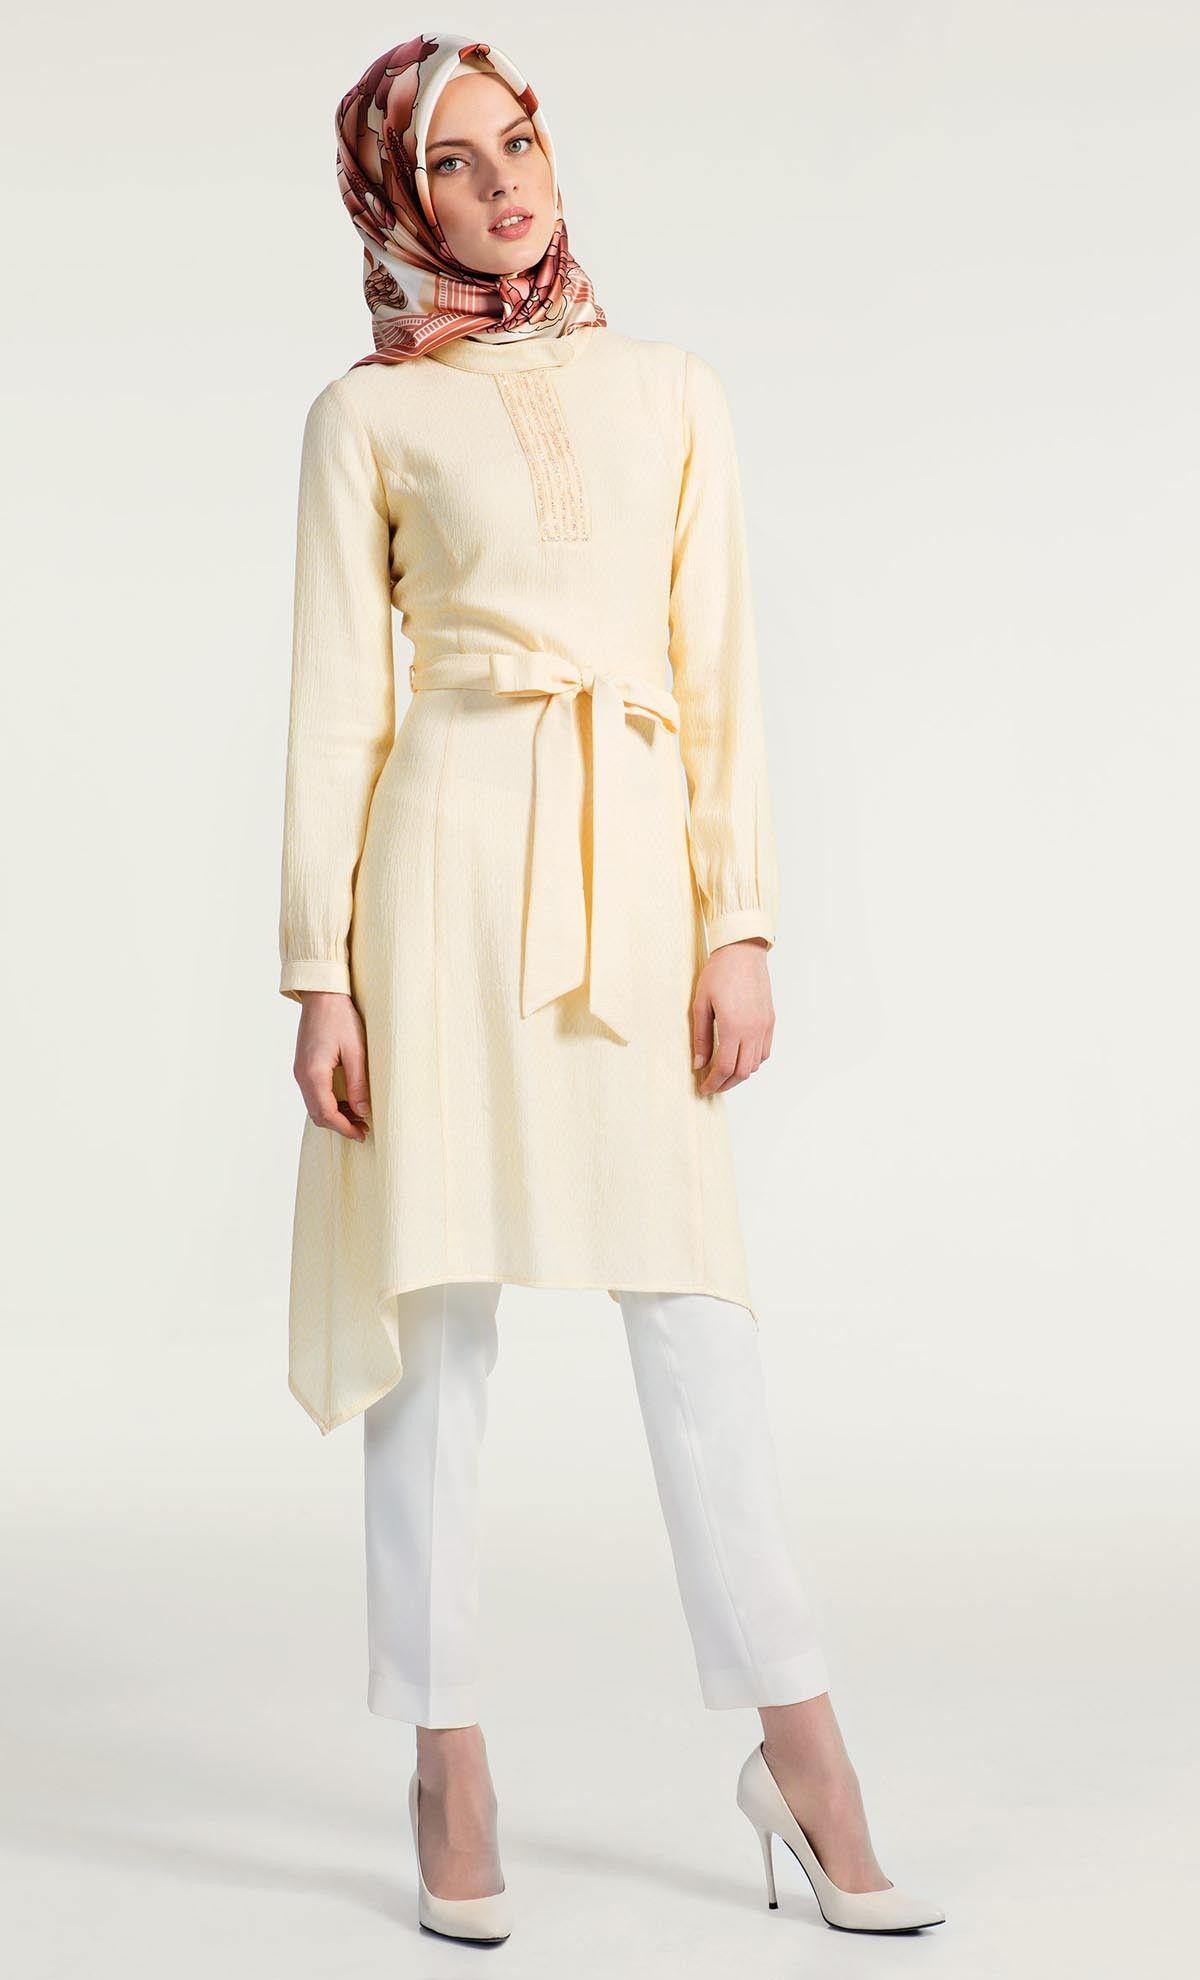 Tugba Store Tesettur Giyim Tesettur Elbise Pardesu Manto Online Alisveris